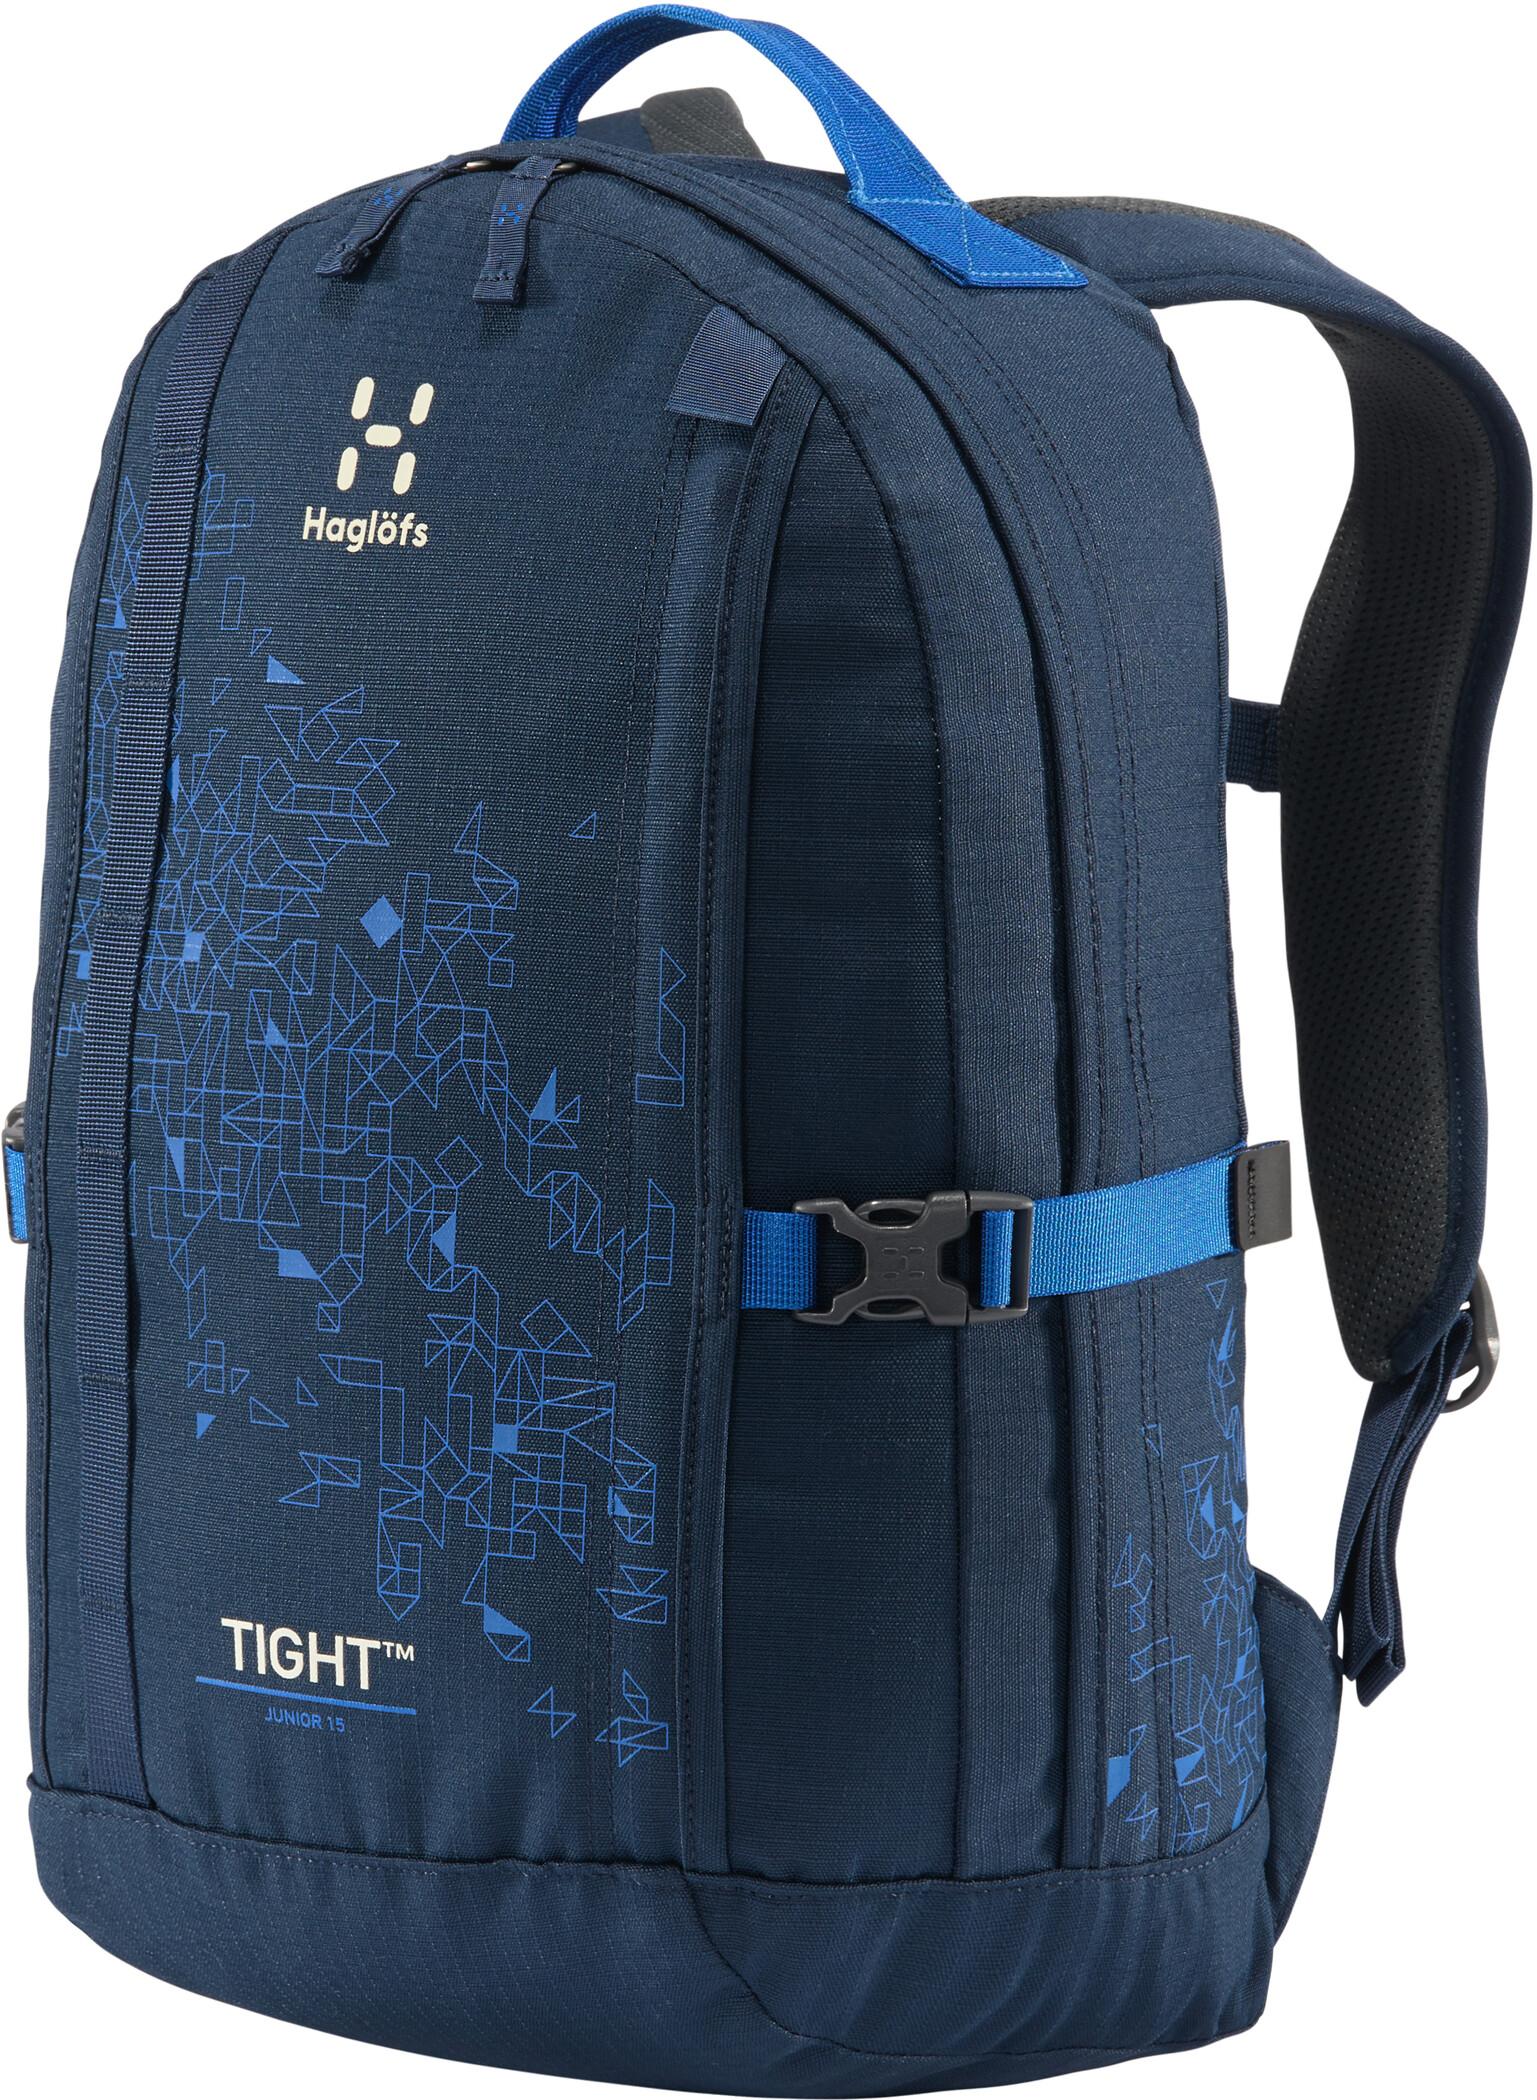 Haglöfs Tight 15 Backpack Youth